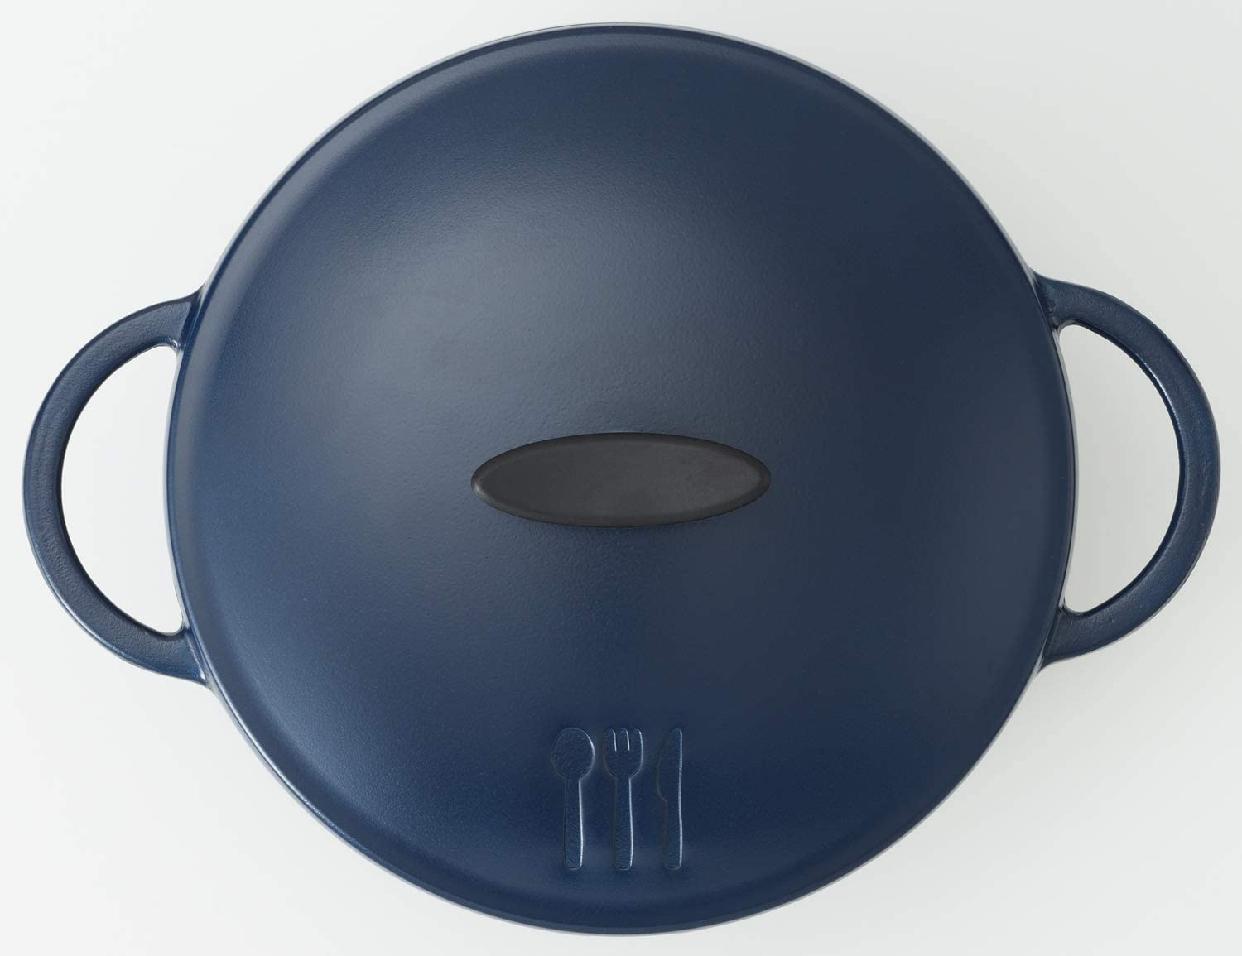 YOSHIKAWA(ヨシカワ) 栗原はるみ うまみ鍋 ネイビー 22cm HK11636の商品画像4